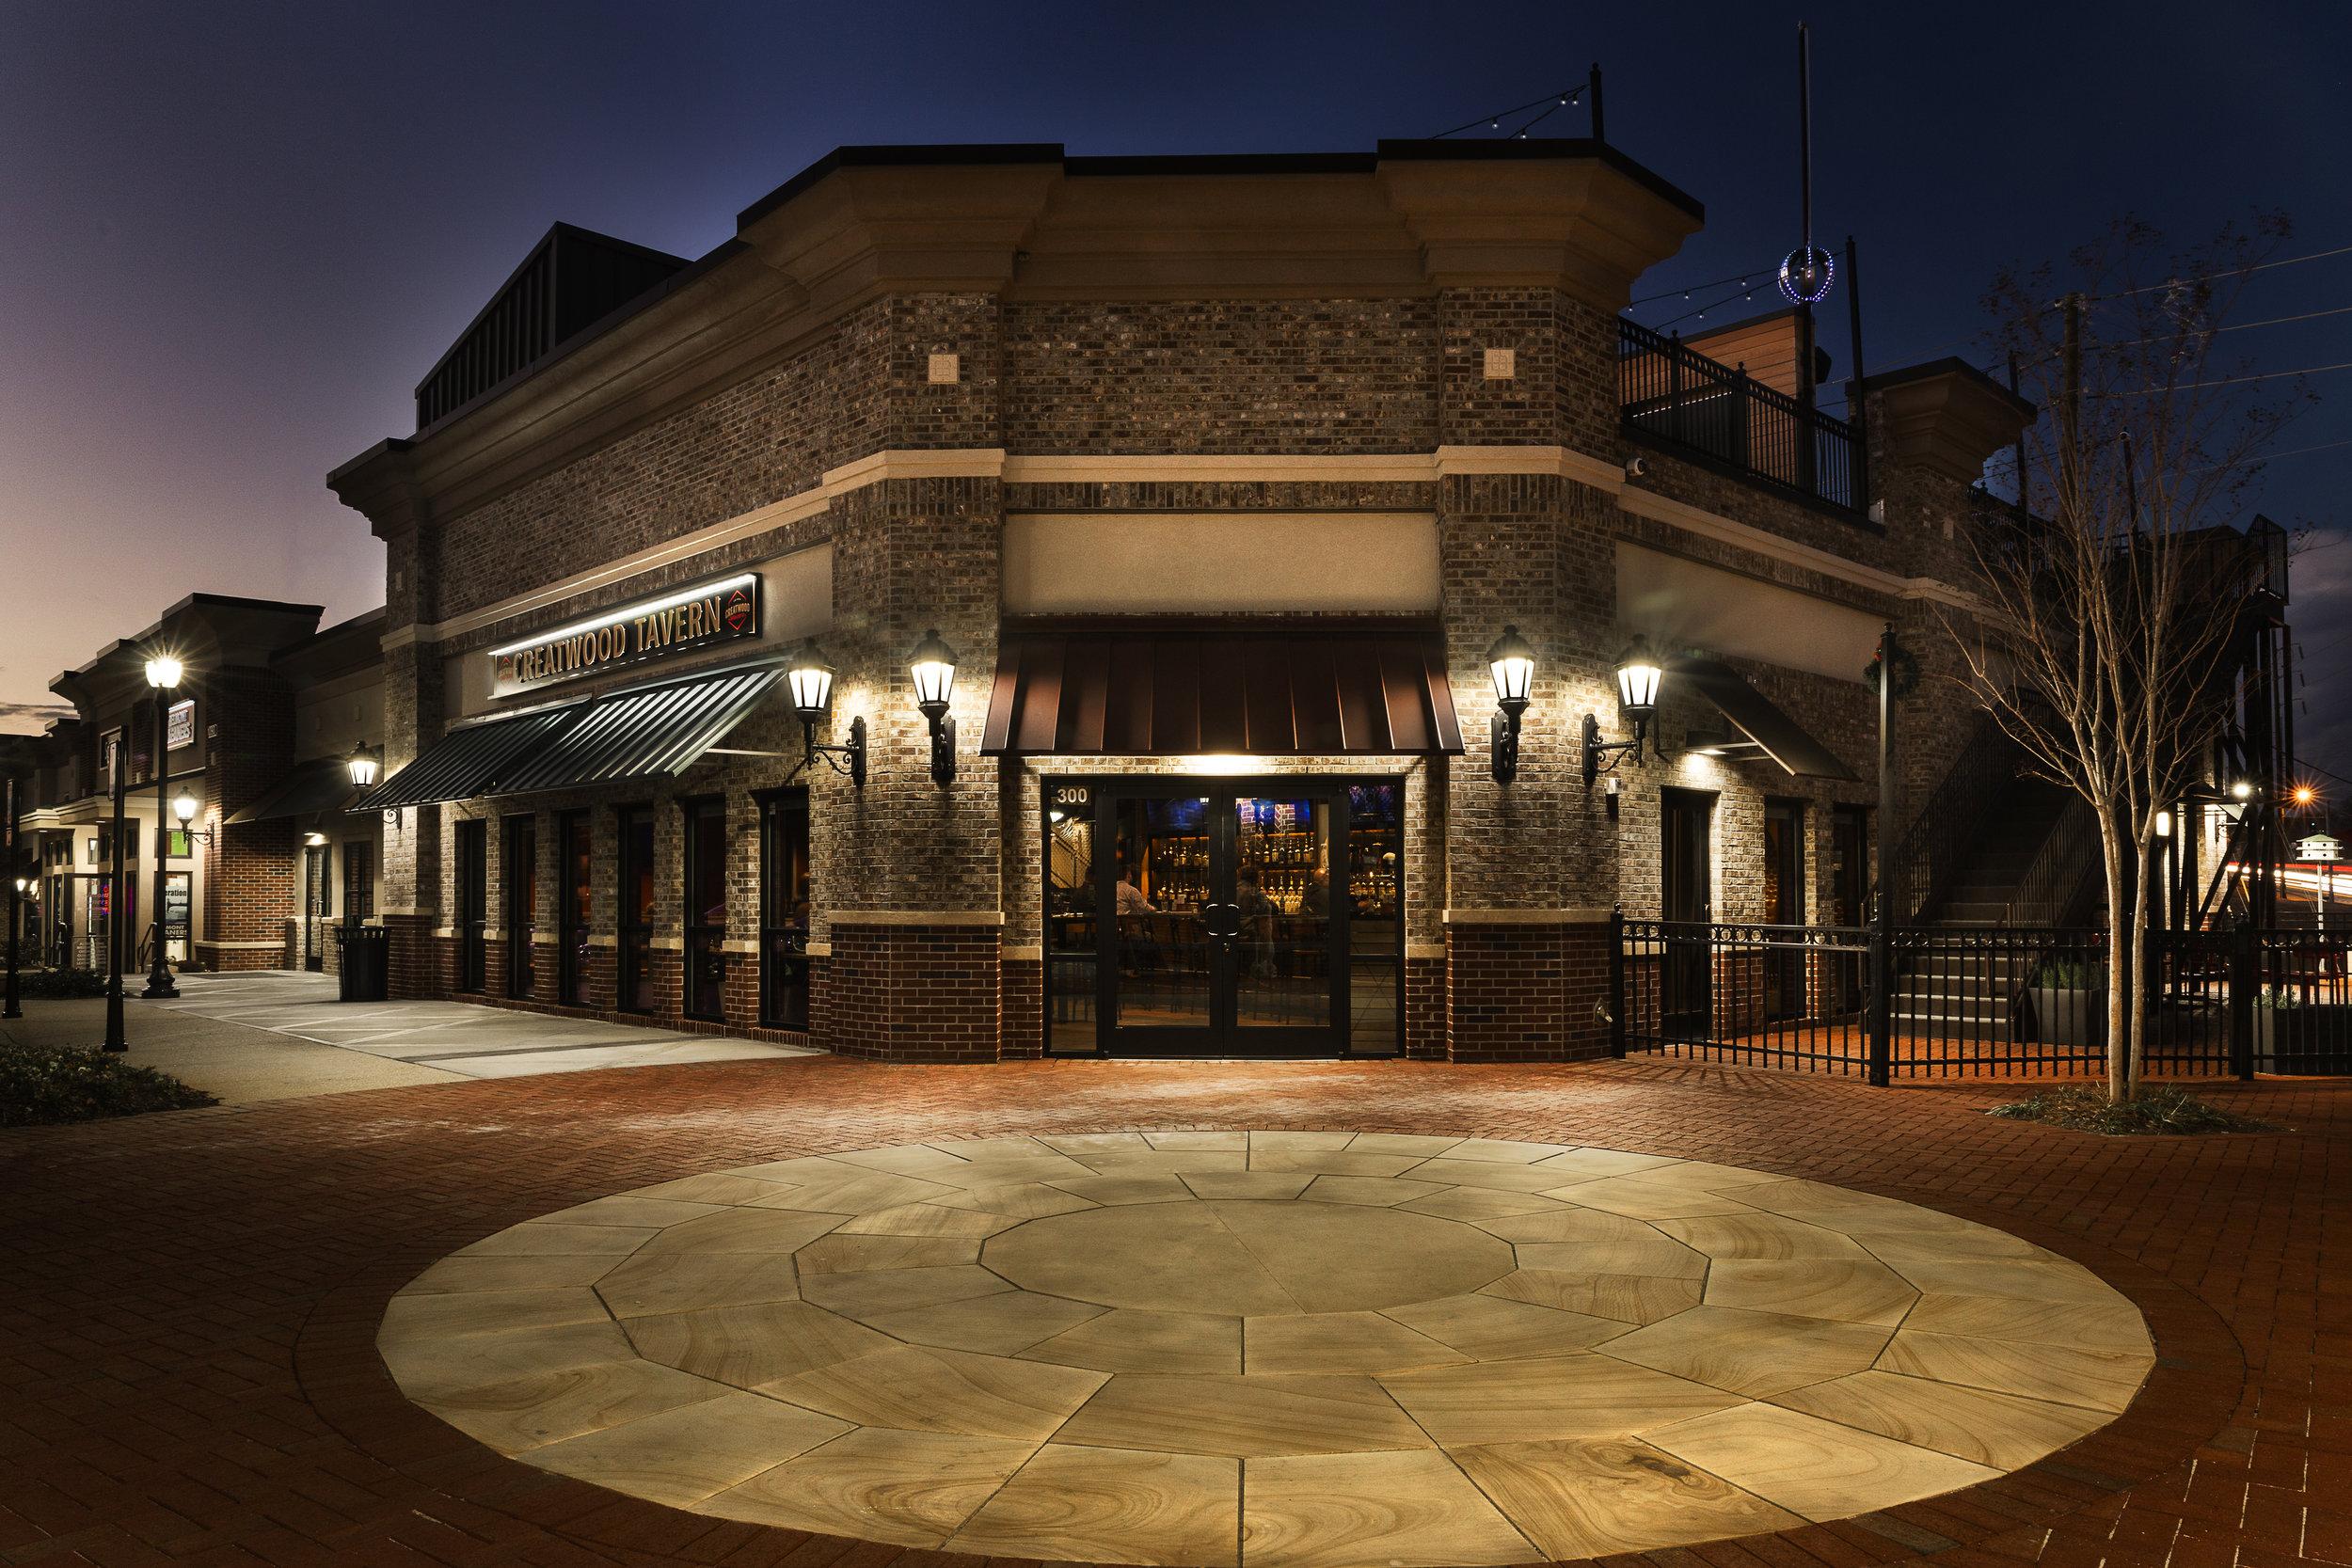 CreatWood Tavern, Smyrna, GA for Pellicano Construction